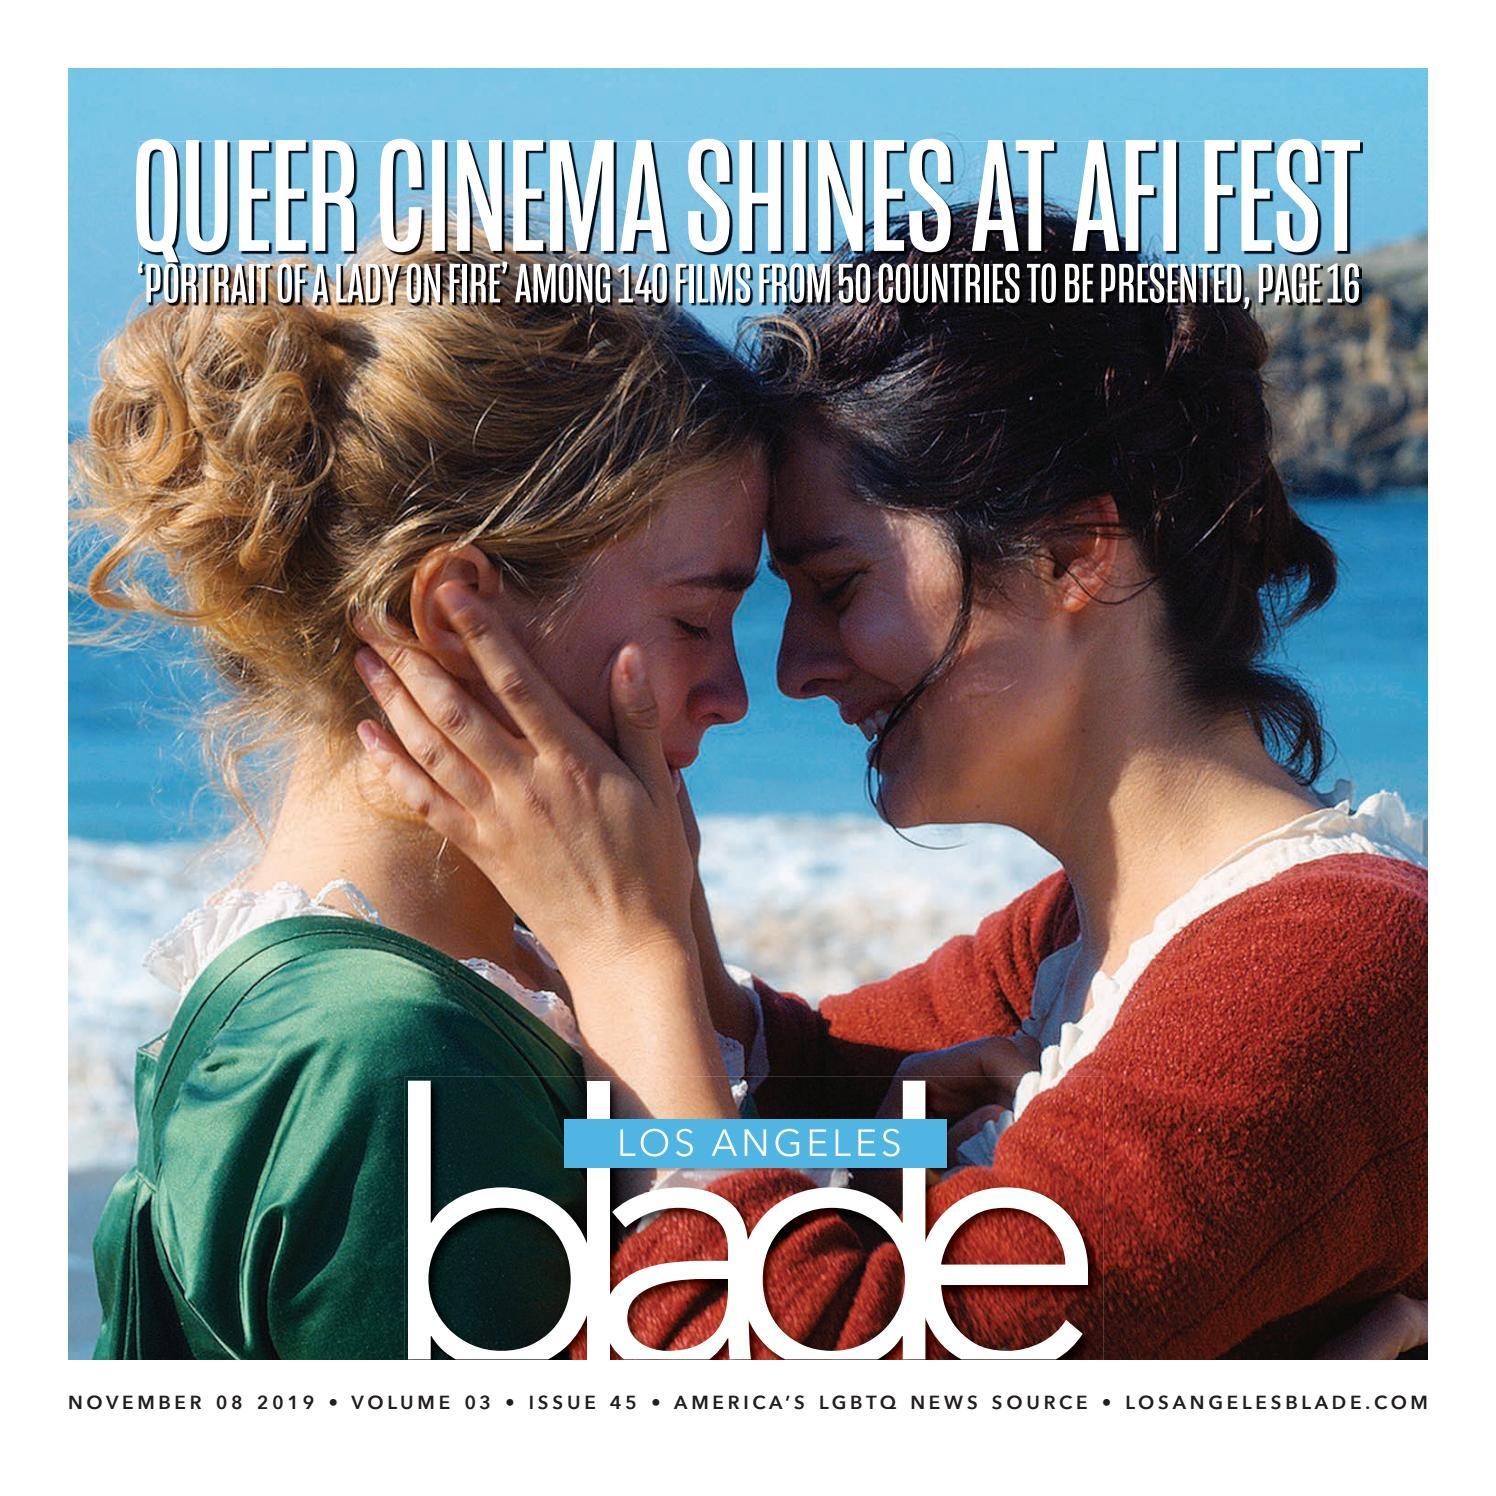 Asier Actor Porno Gay Español losangelesblade, volume 3, issue 45, november 8, 2019